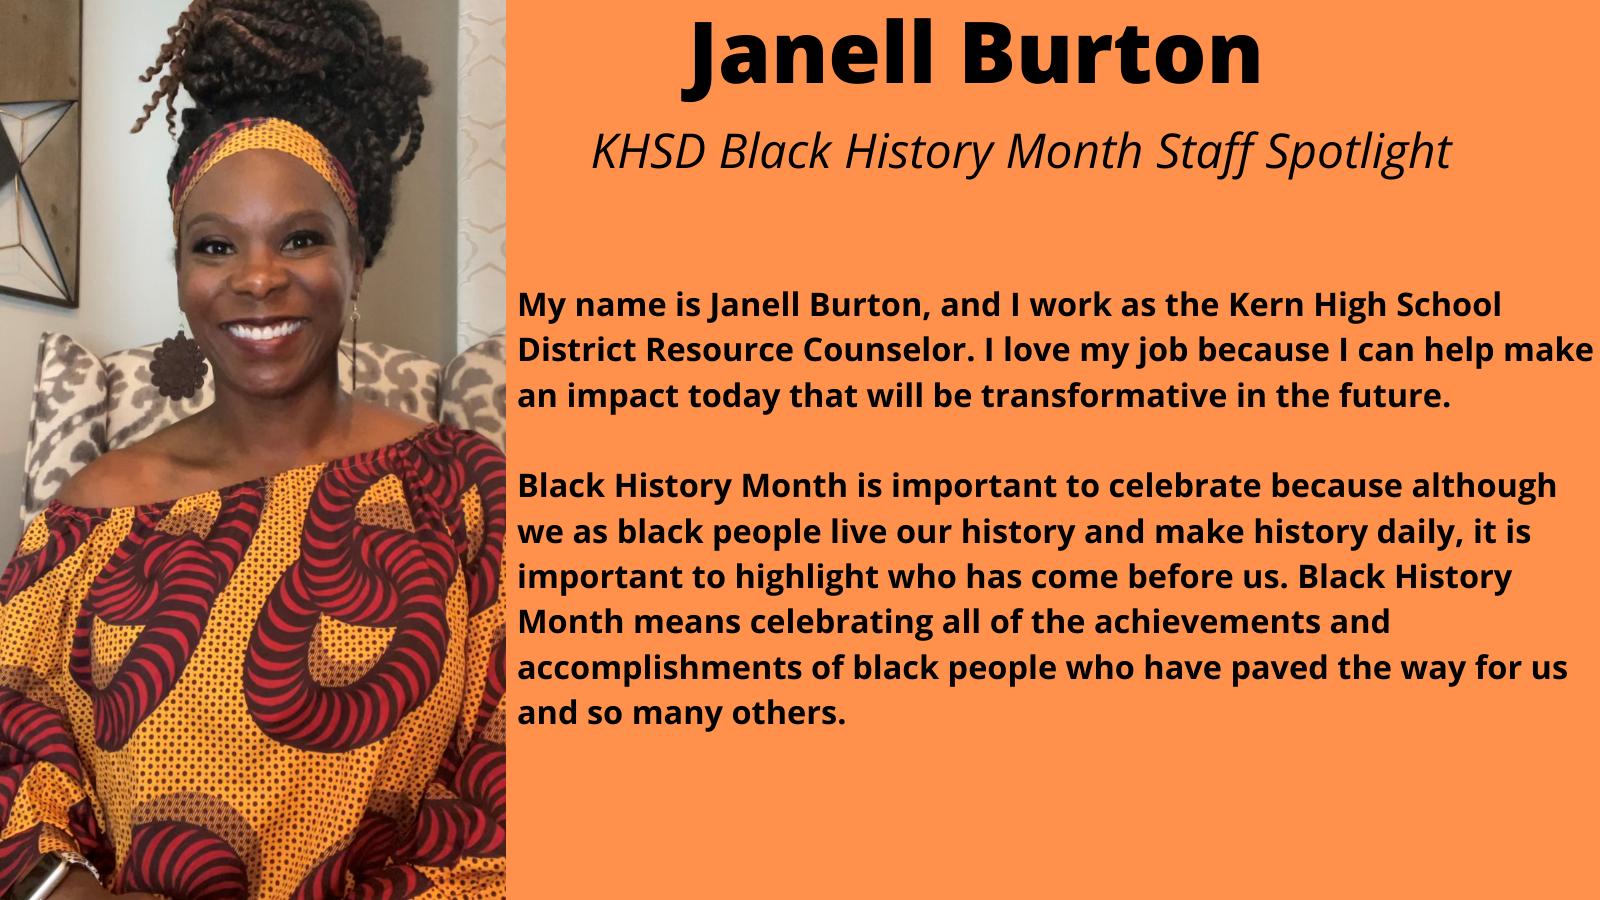 KHSD Black History Month Staff Spotlight: Janell Burton